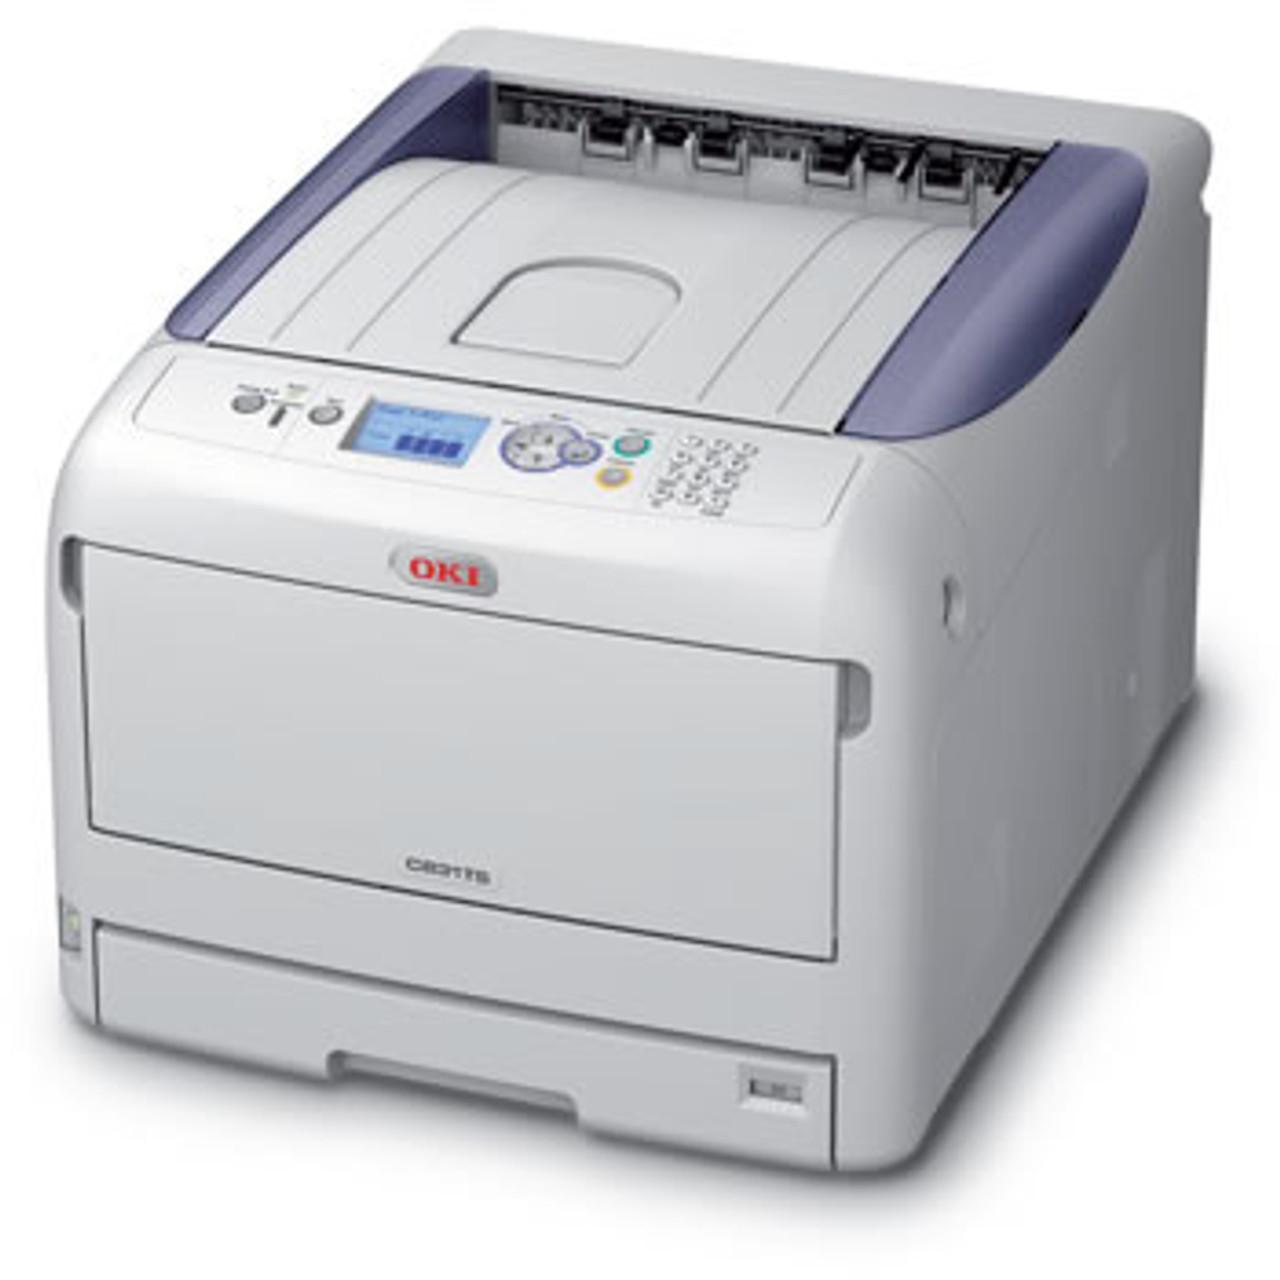 OKI C831TS CMYK Laser Transfer Printer + Laser Paper Samples